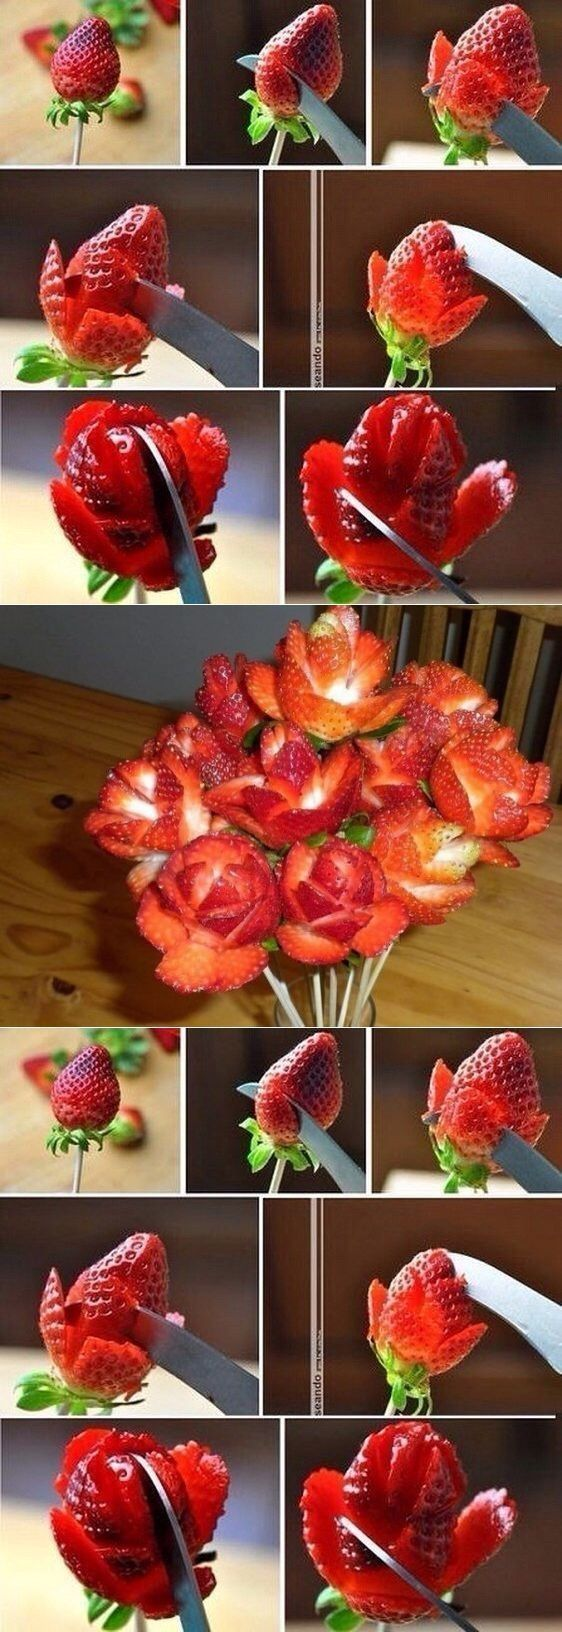 Flores con fresas by irma